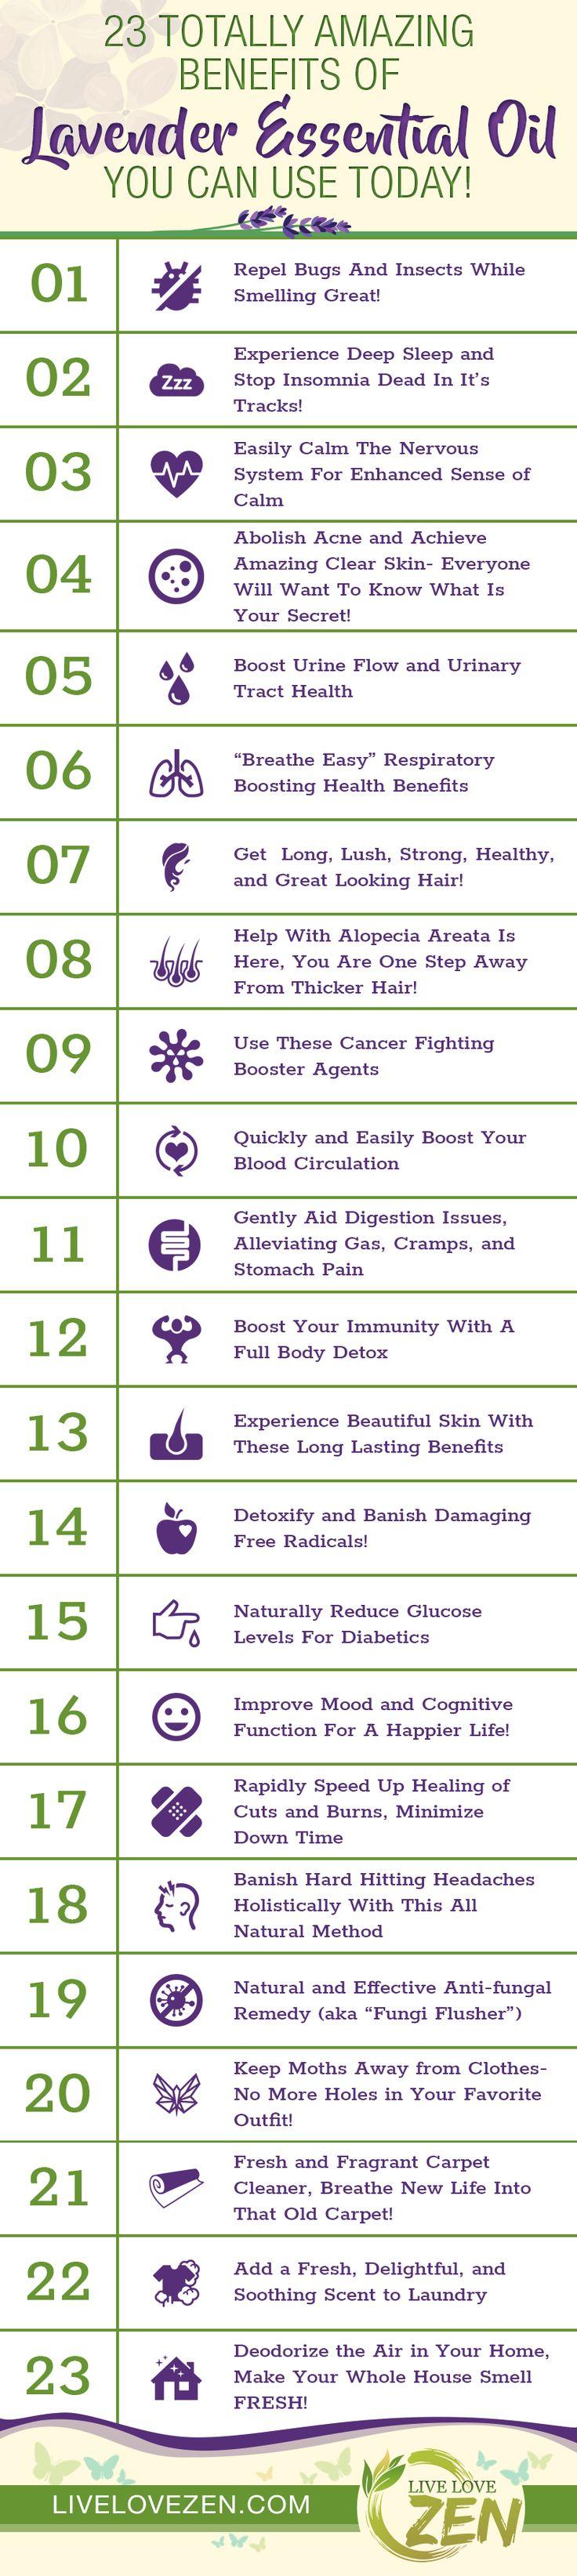 Lavender Essential Oil Benefits Infographic